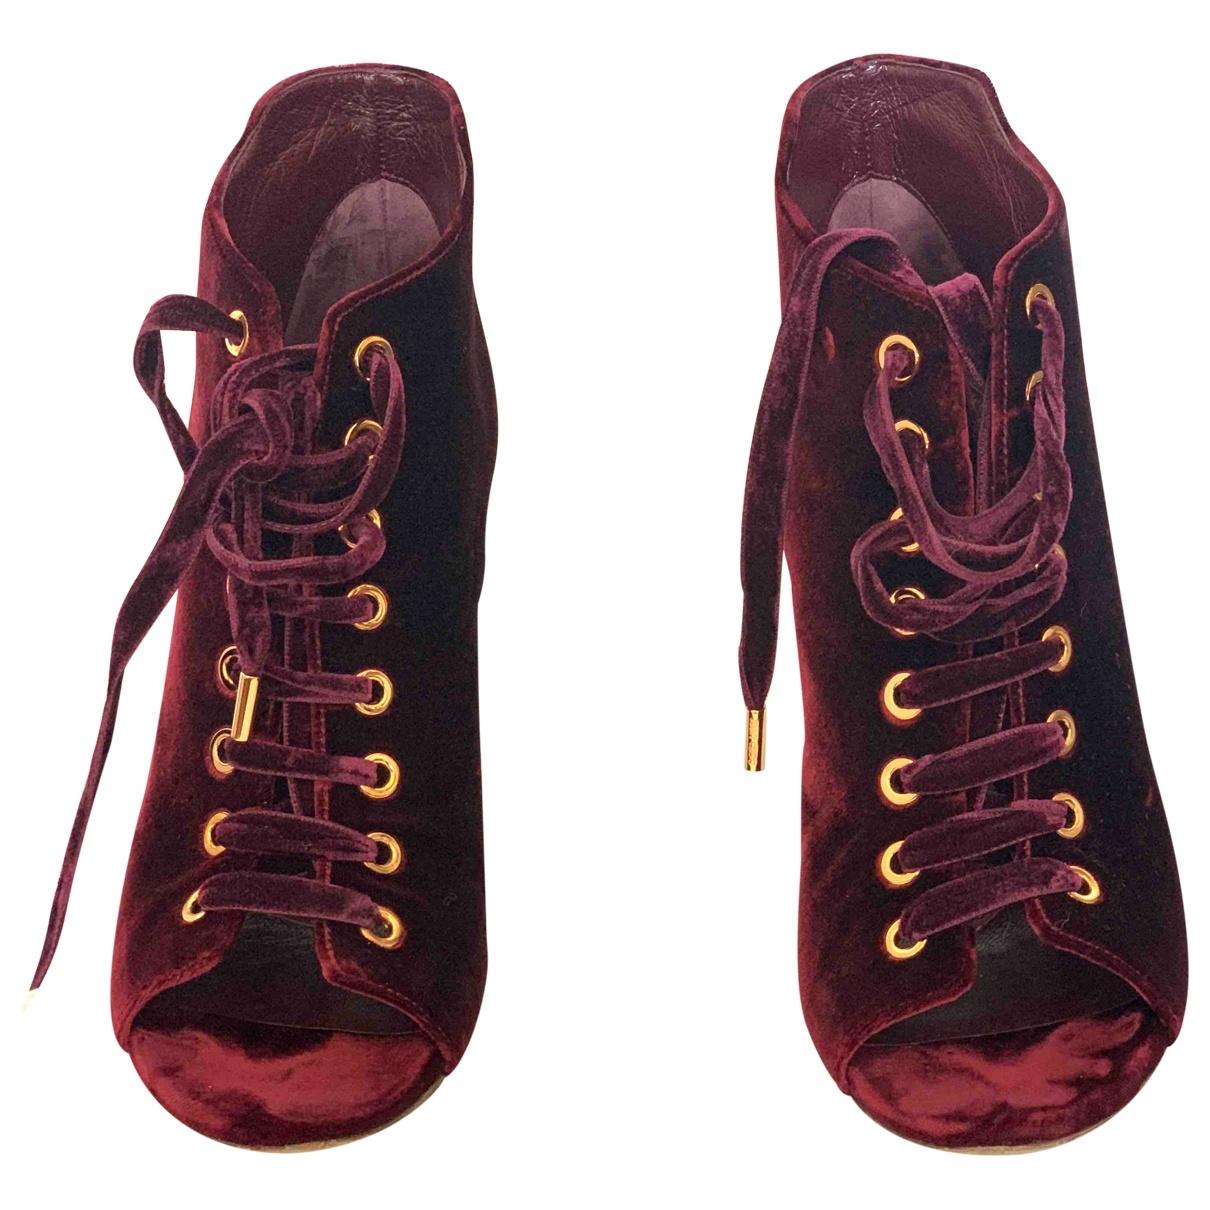 Botas con cordones Mavis de Terciopelo Jimmy Choo